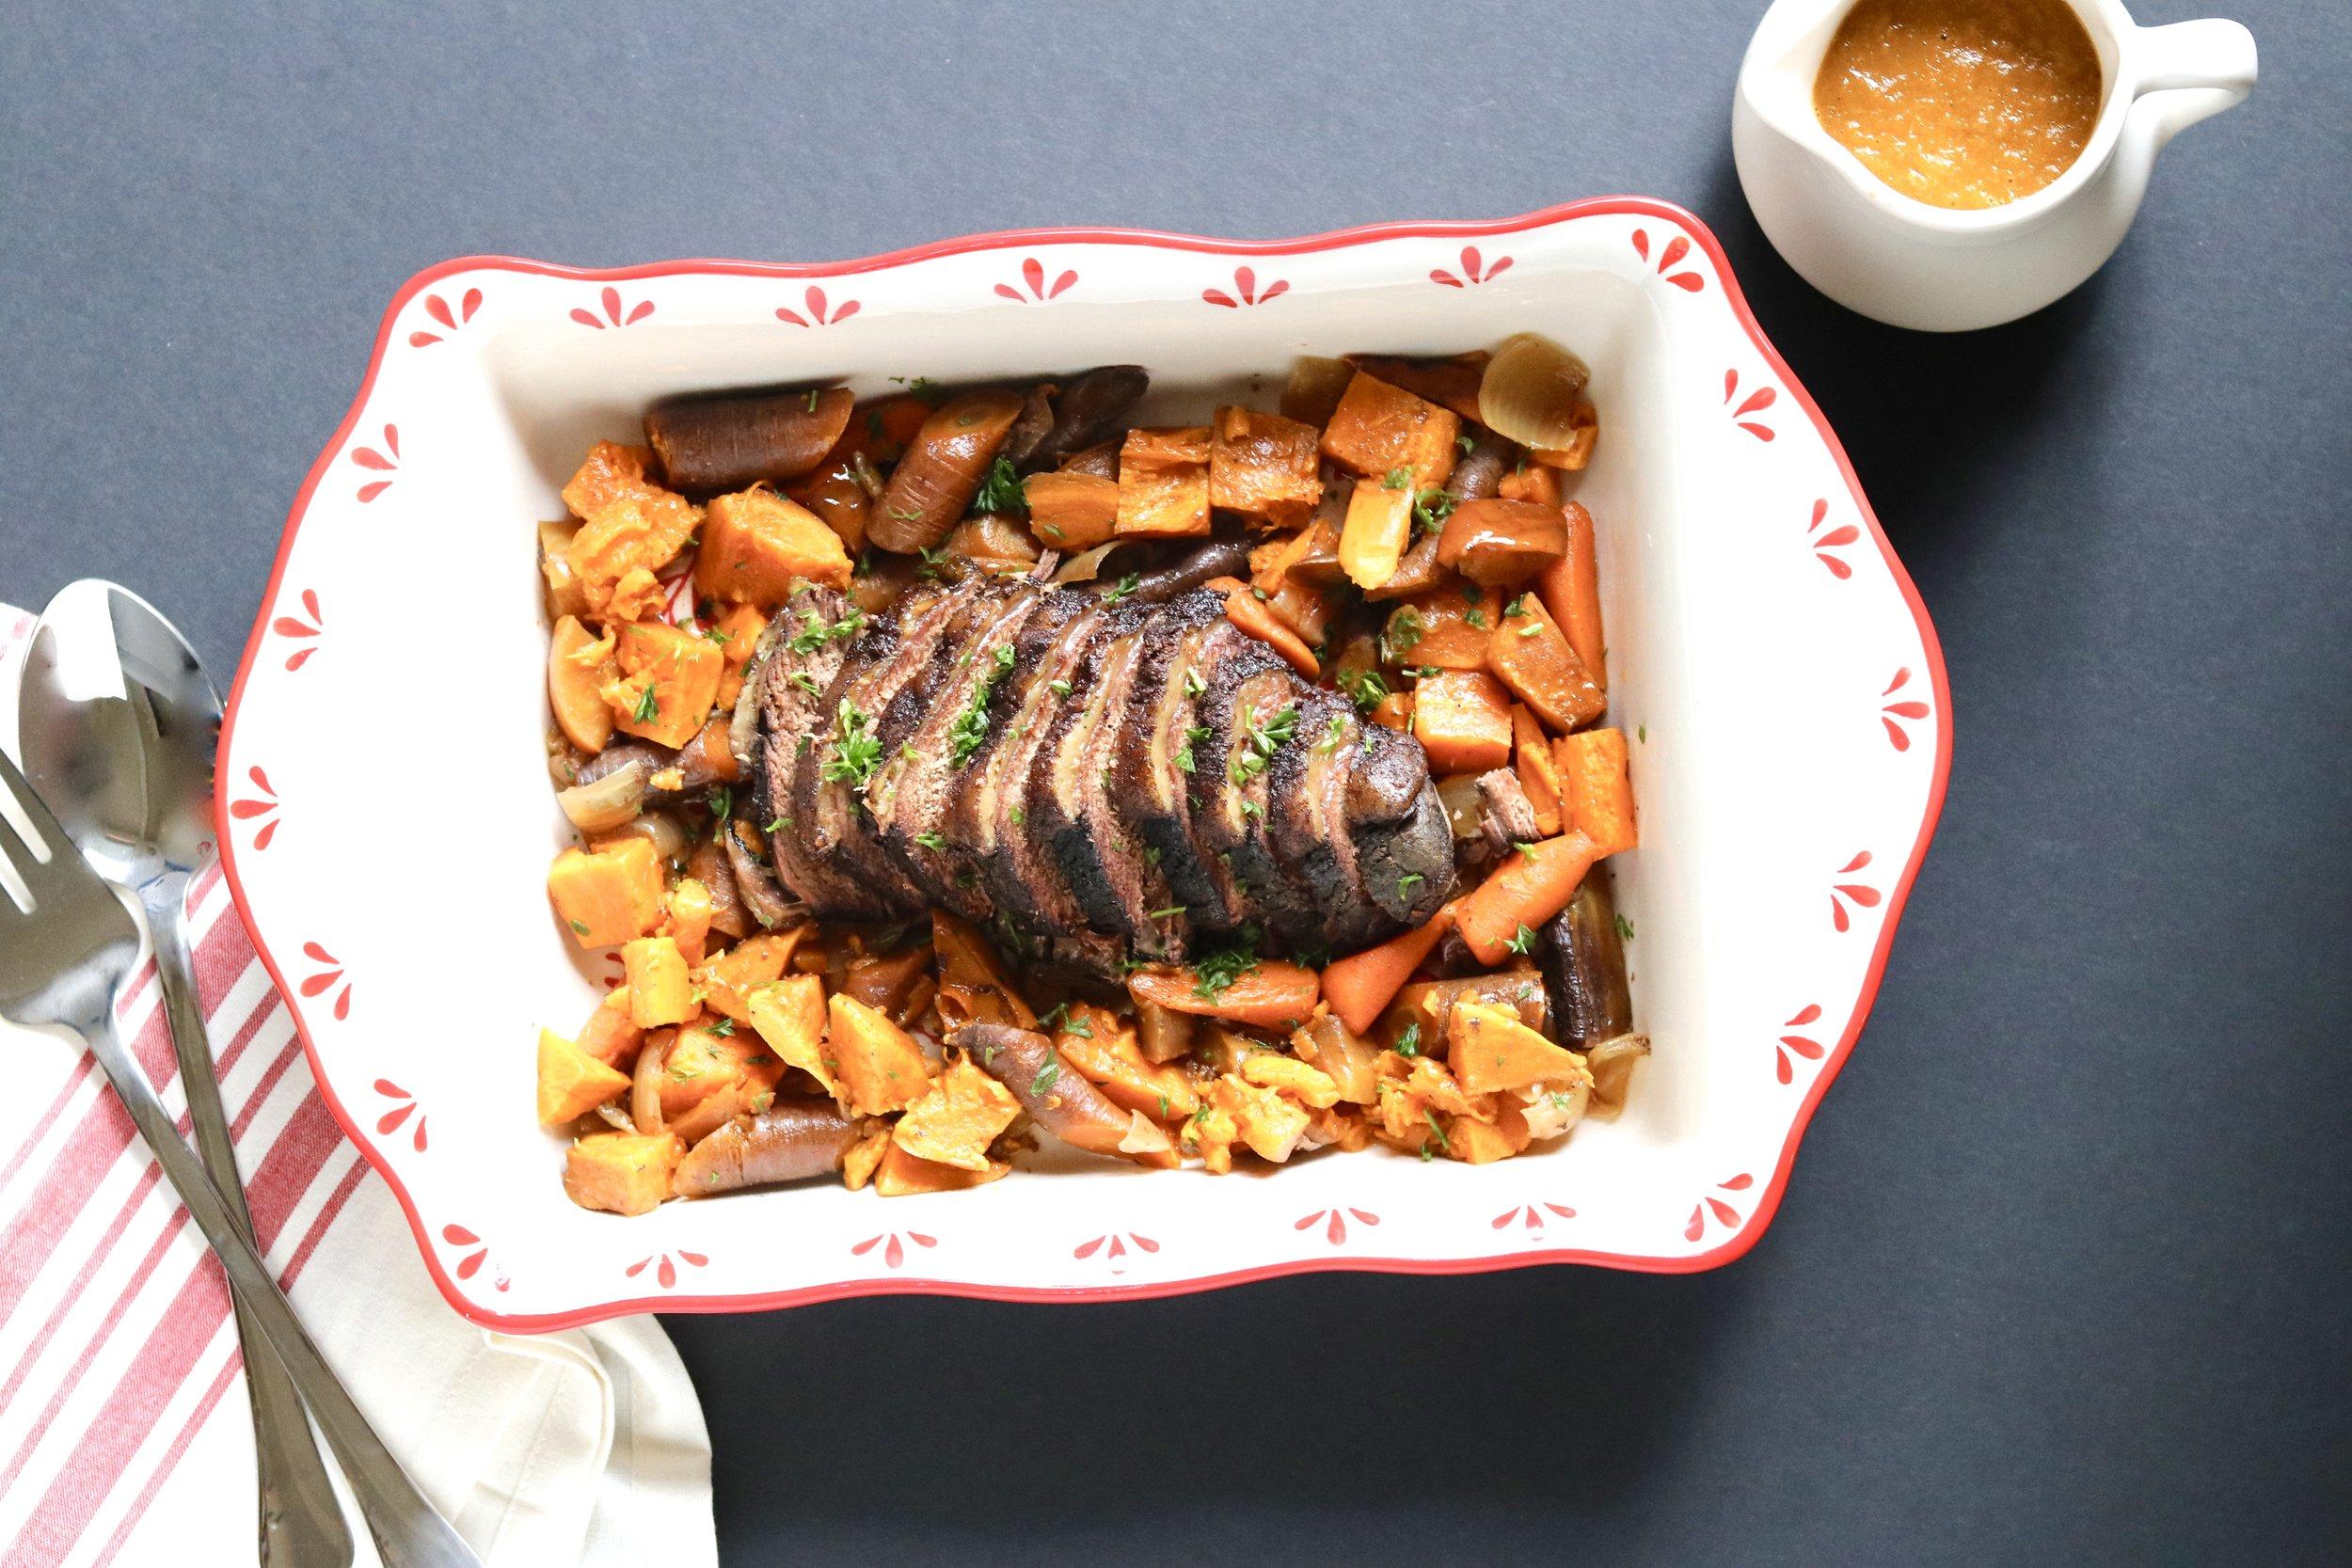 Slowcooker Christmas Roast I'd Eat That Food